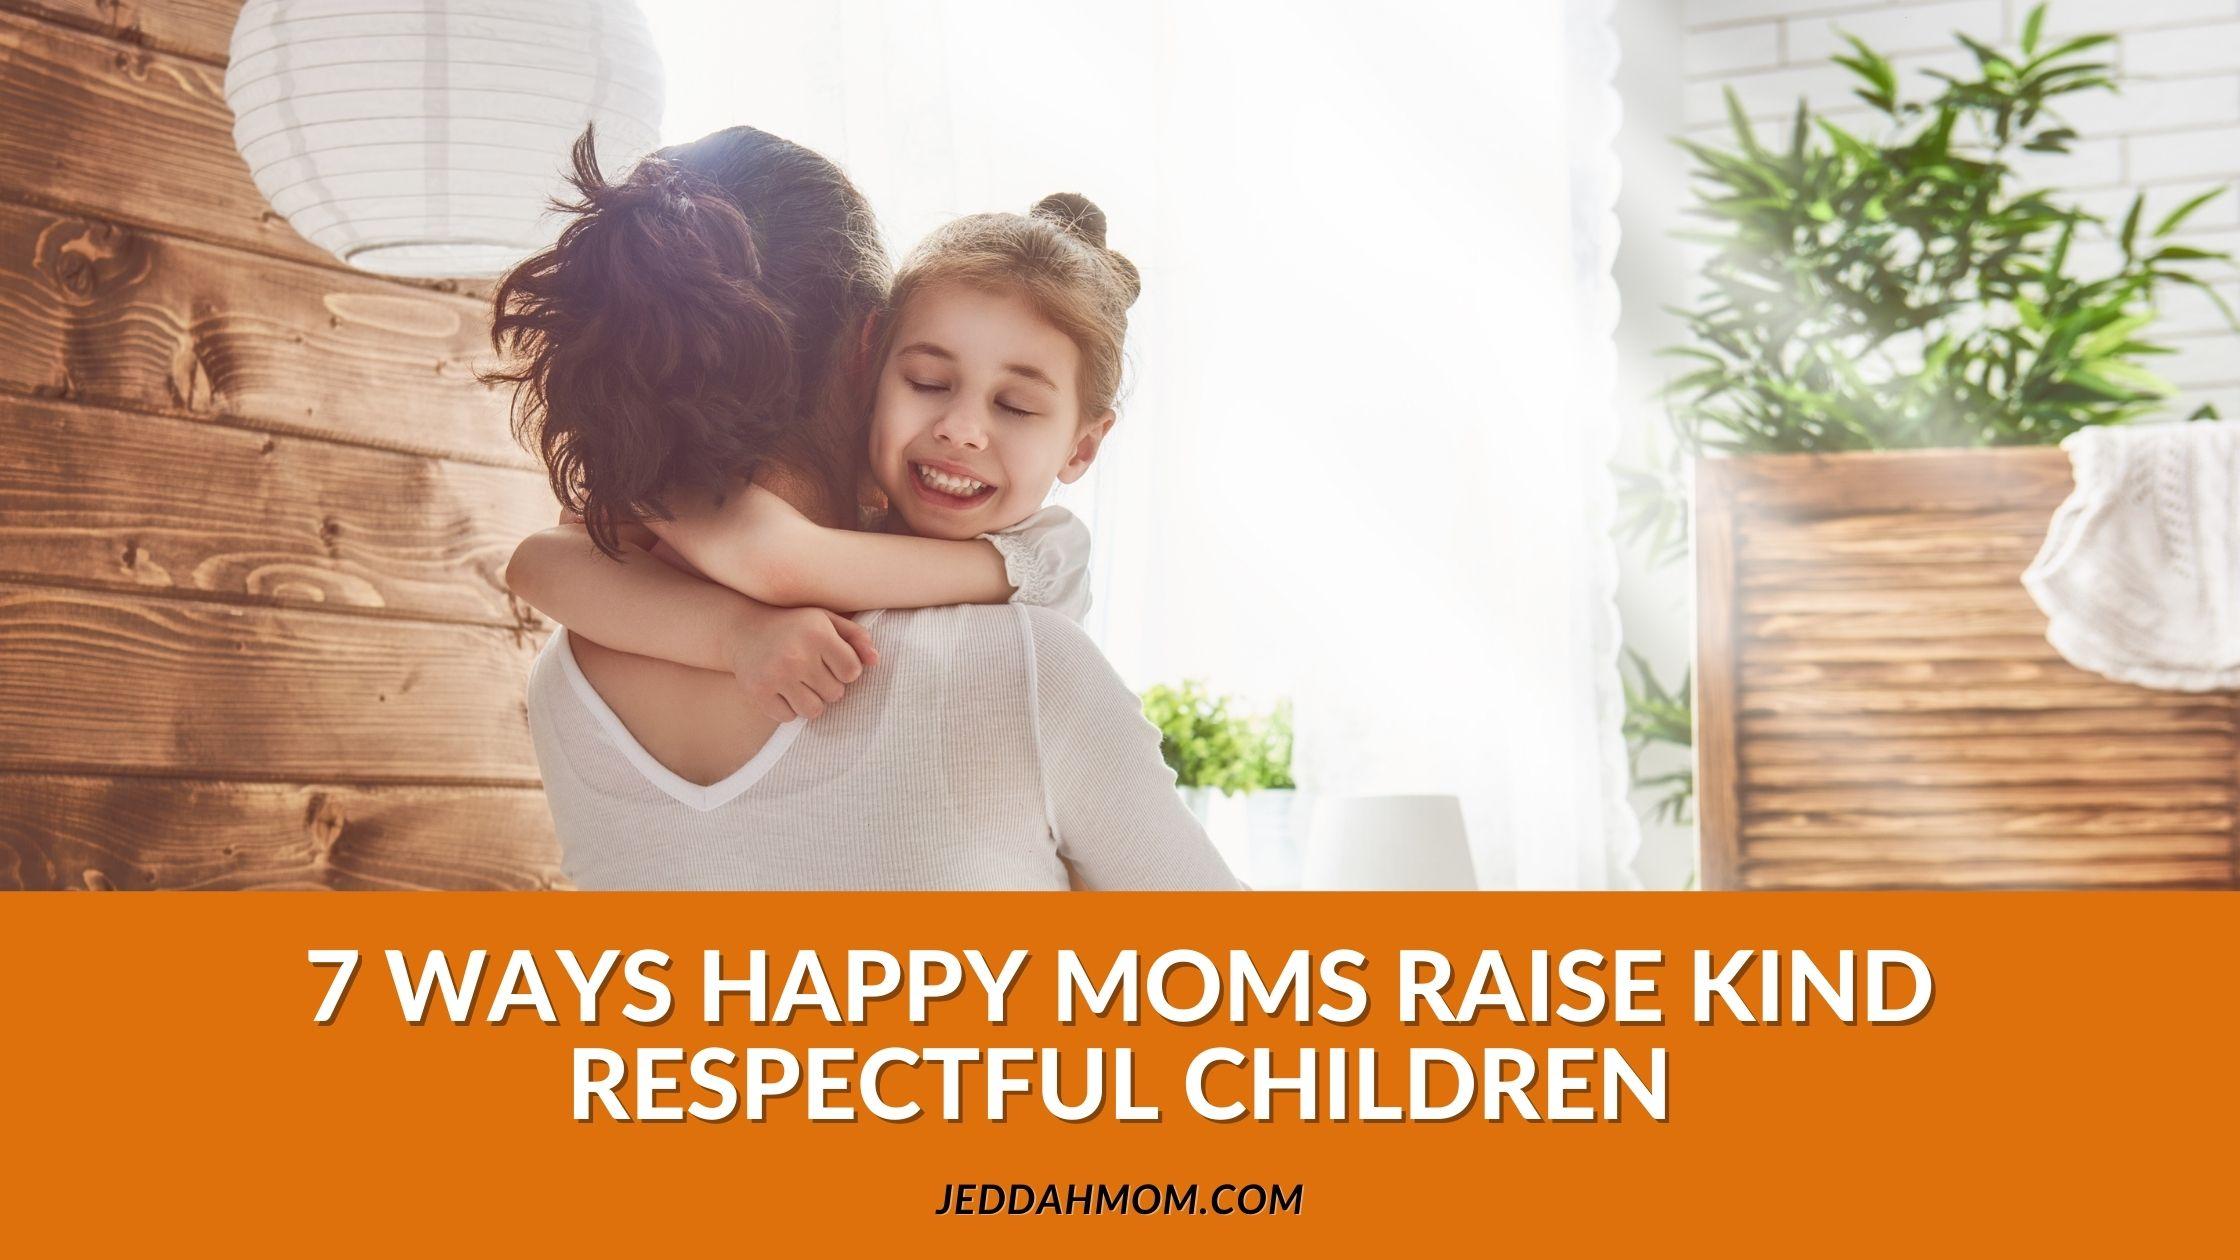 7 WAYS HAPPY MOMS RAISE KIND RESPECTFUL CHILDREN  JeddahMom